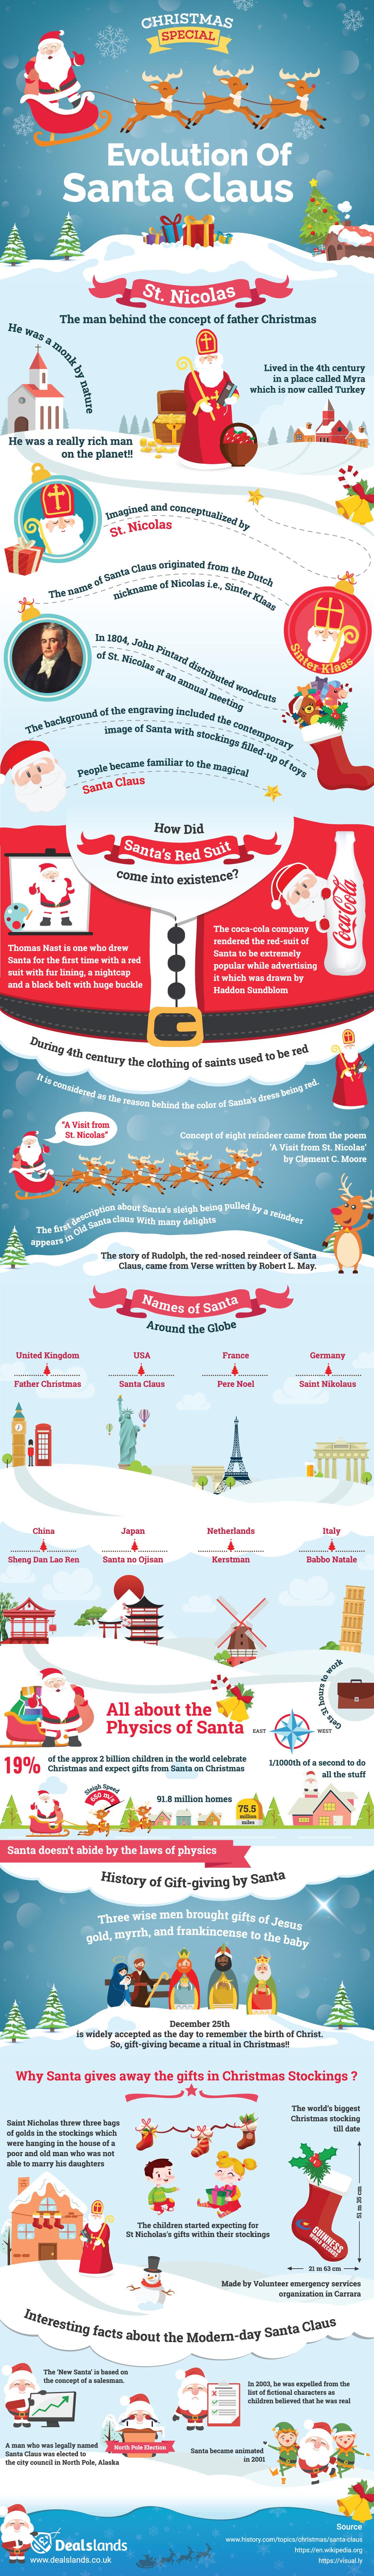 The Evolution Of Santa Claus by Dealslands